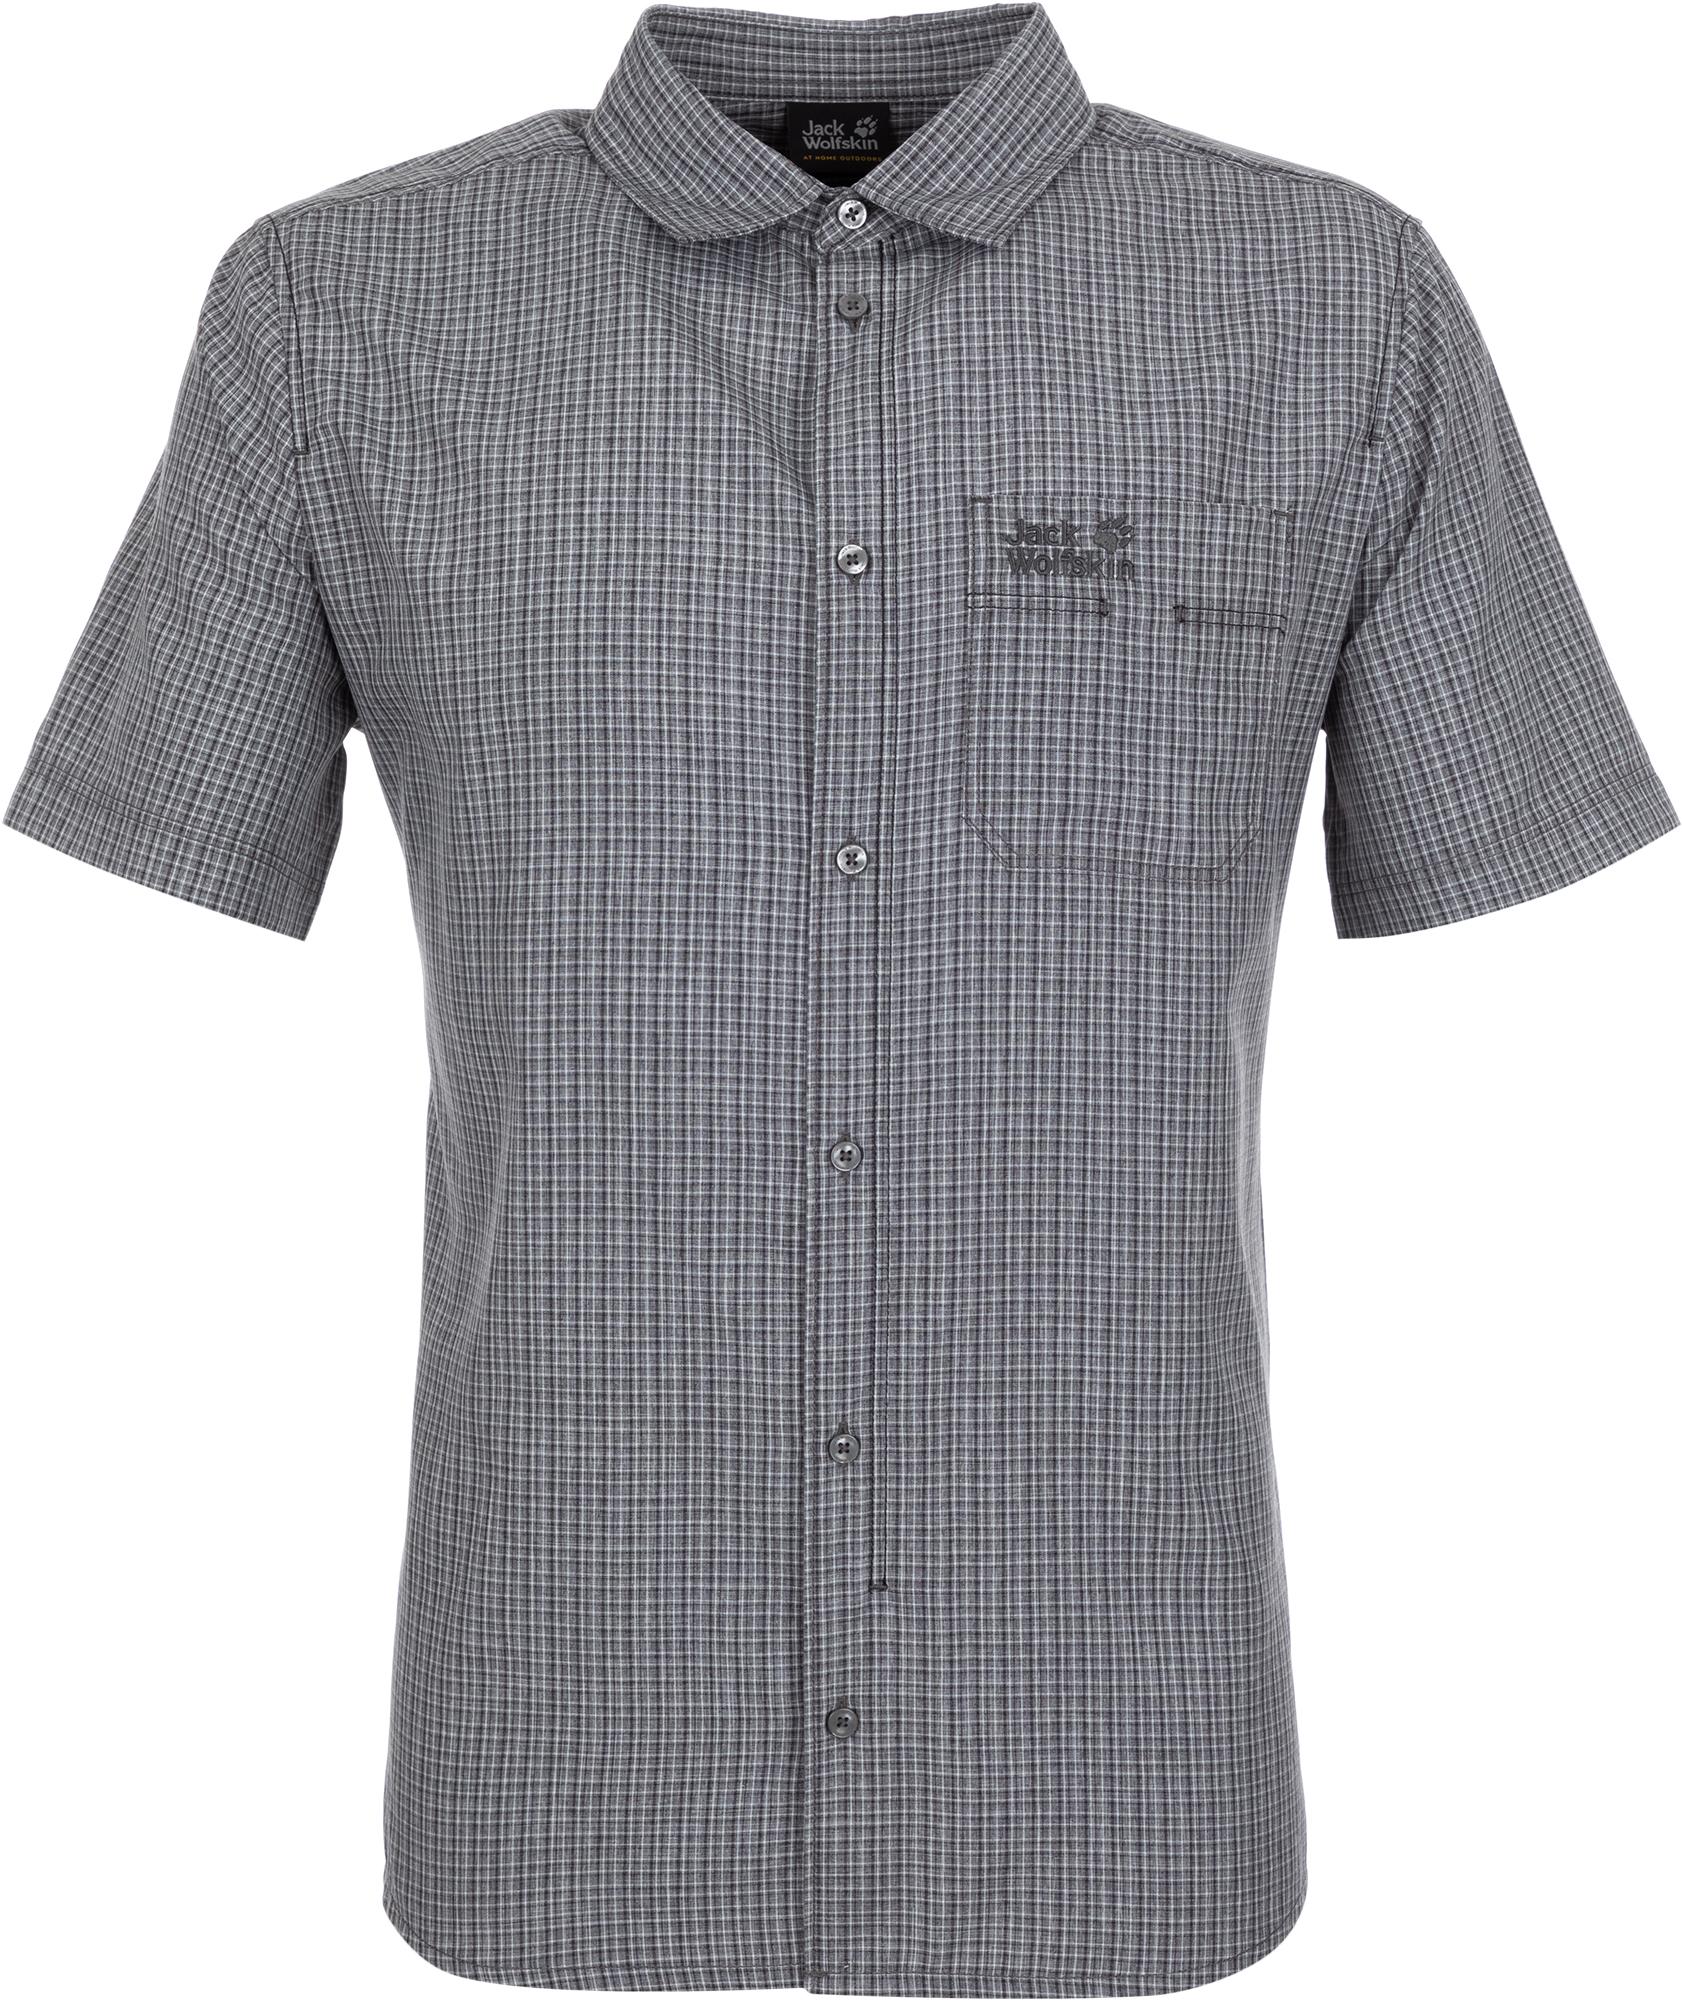 JACK WOLFSKIN Рубашка мужская JACK WOLFSKIN El Dorado, размер 54-56